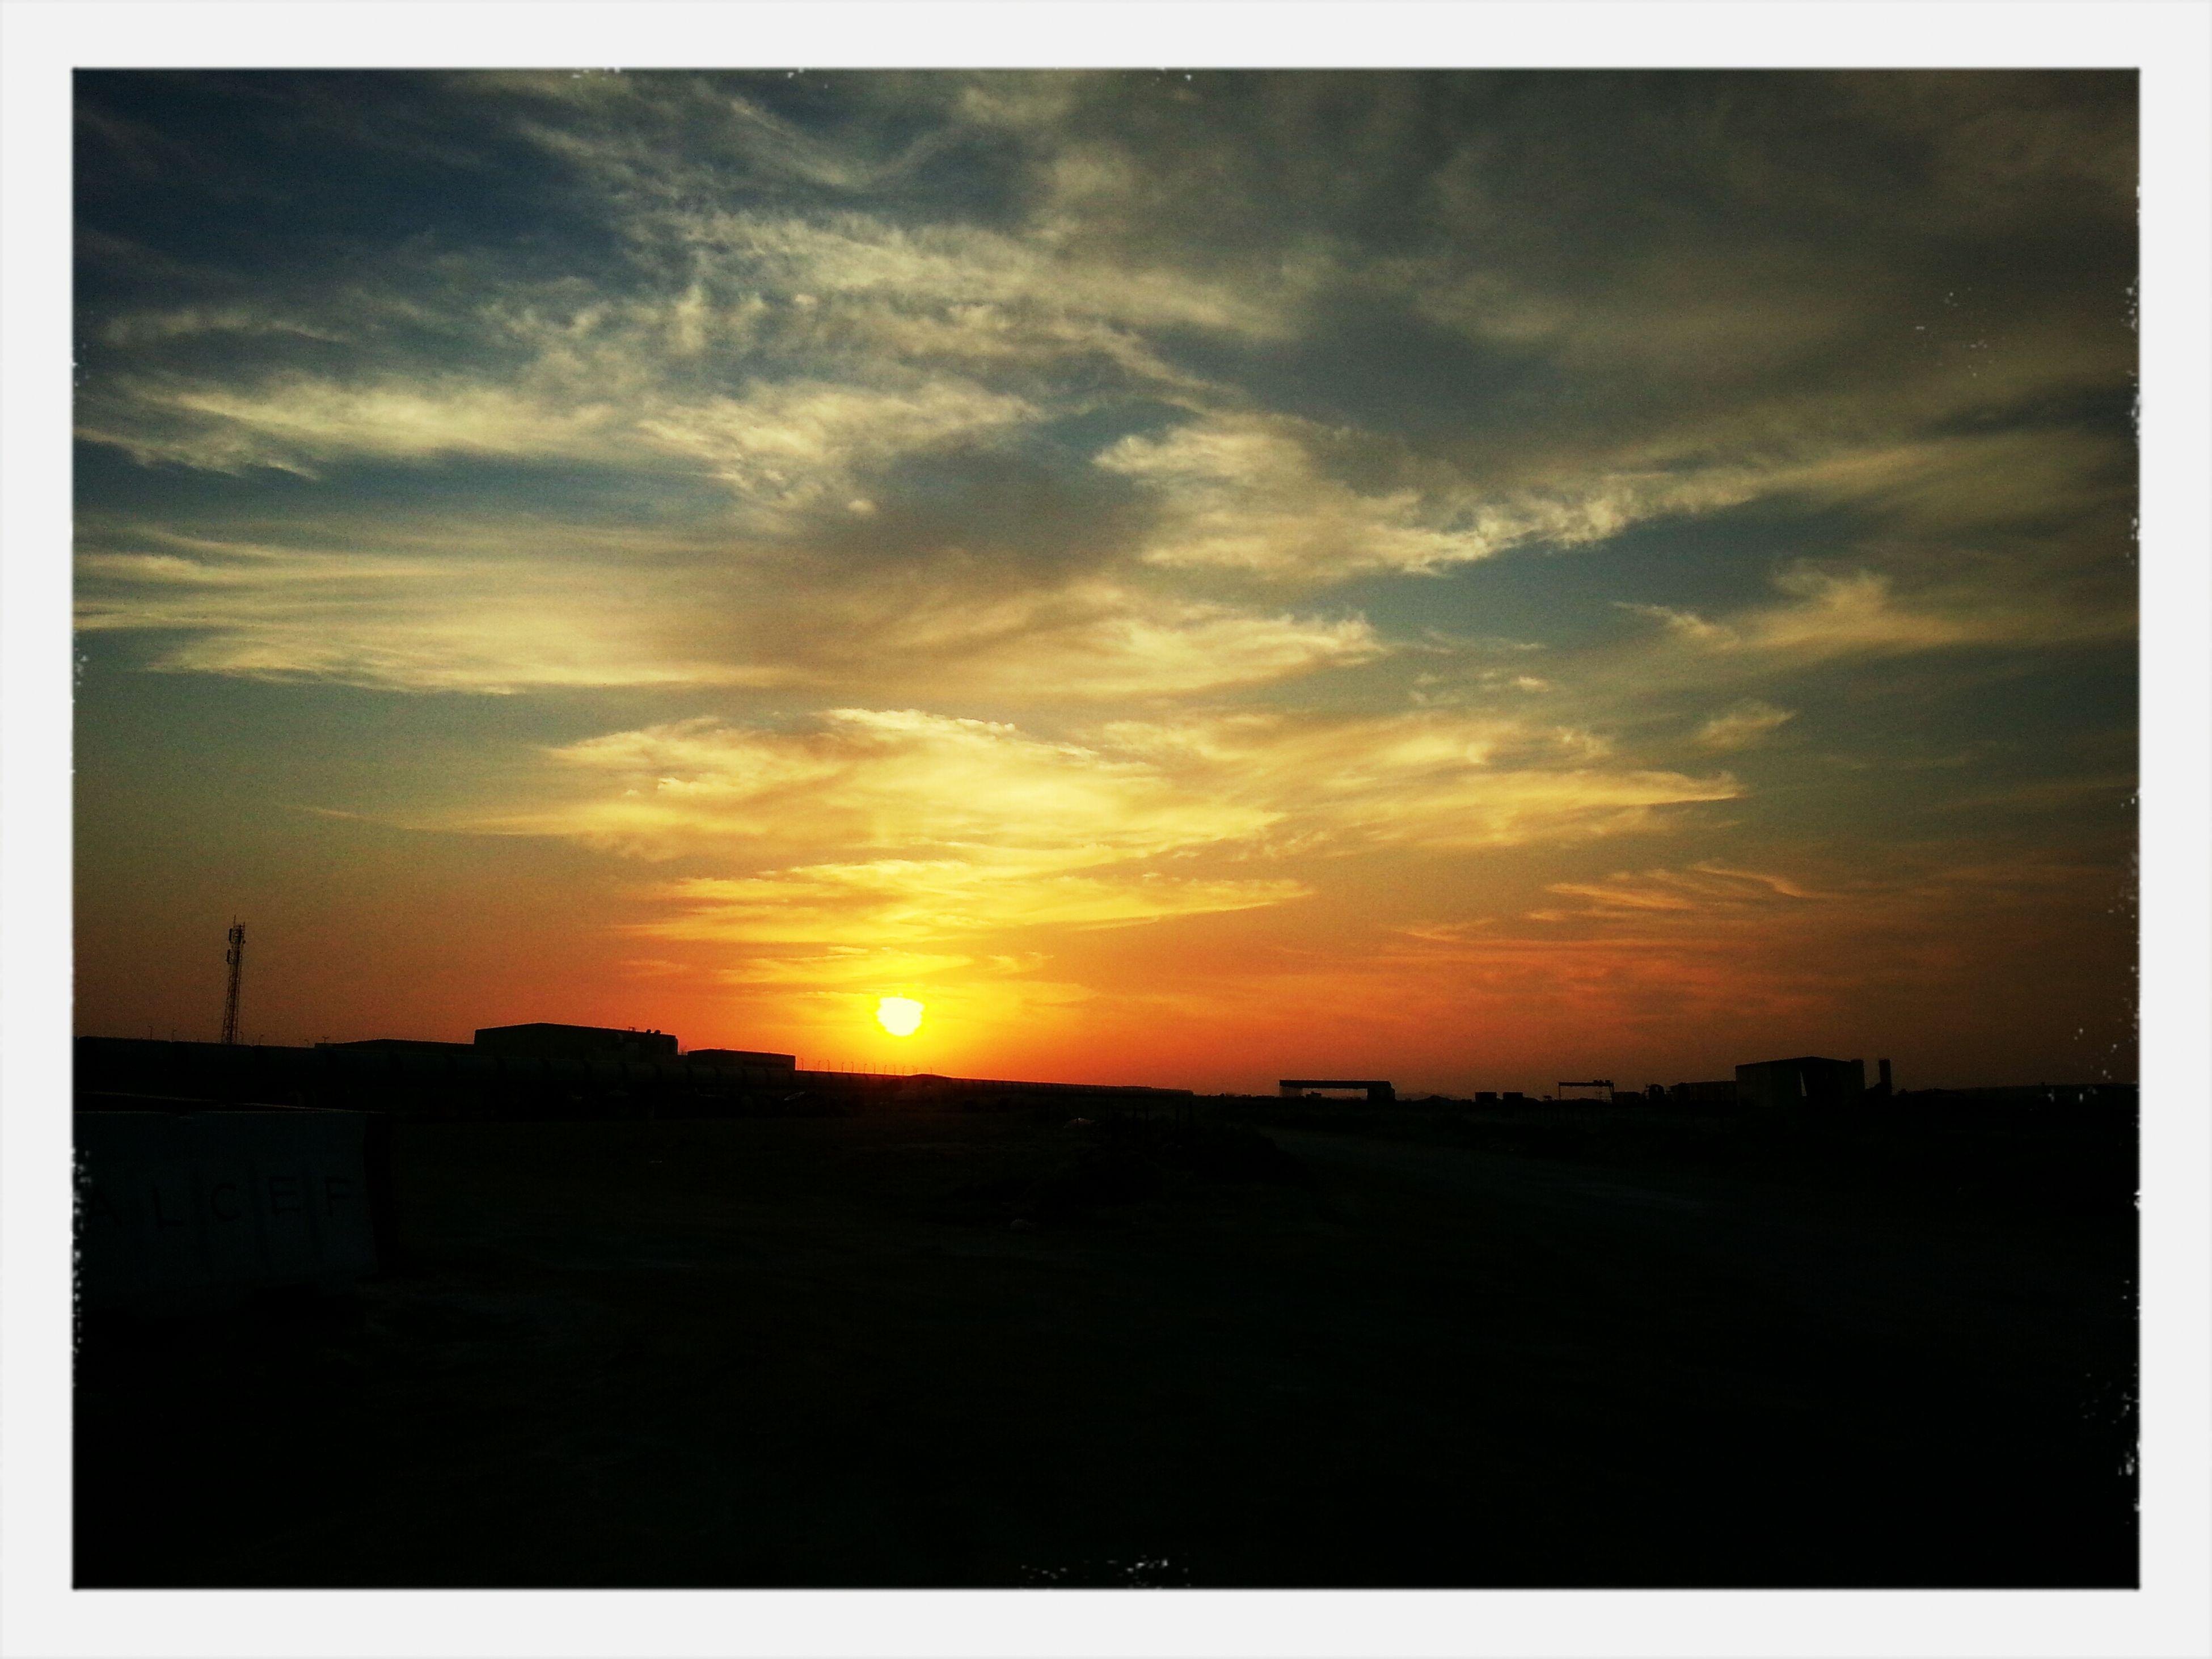 sunset, silhouette, sun, sky, orange color, scenics, beauty in nature, tranquil scene, transfer print, tranquility, cloud - sky, landscape, nature, idyllic, sunlight, auto post production filter, dark, dramatic sky, cloud, built structure